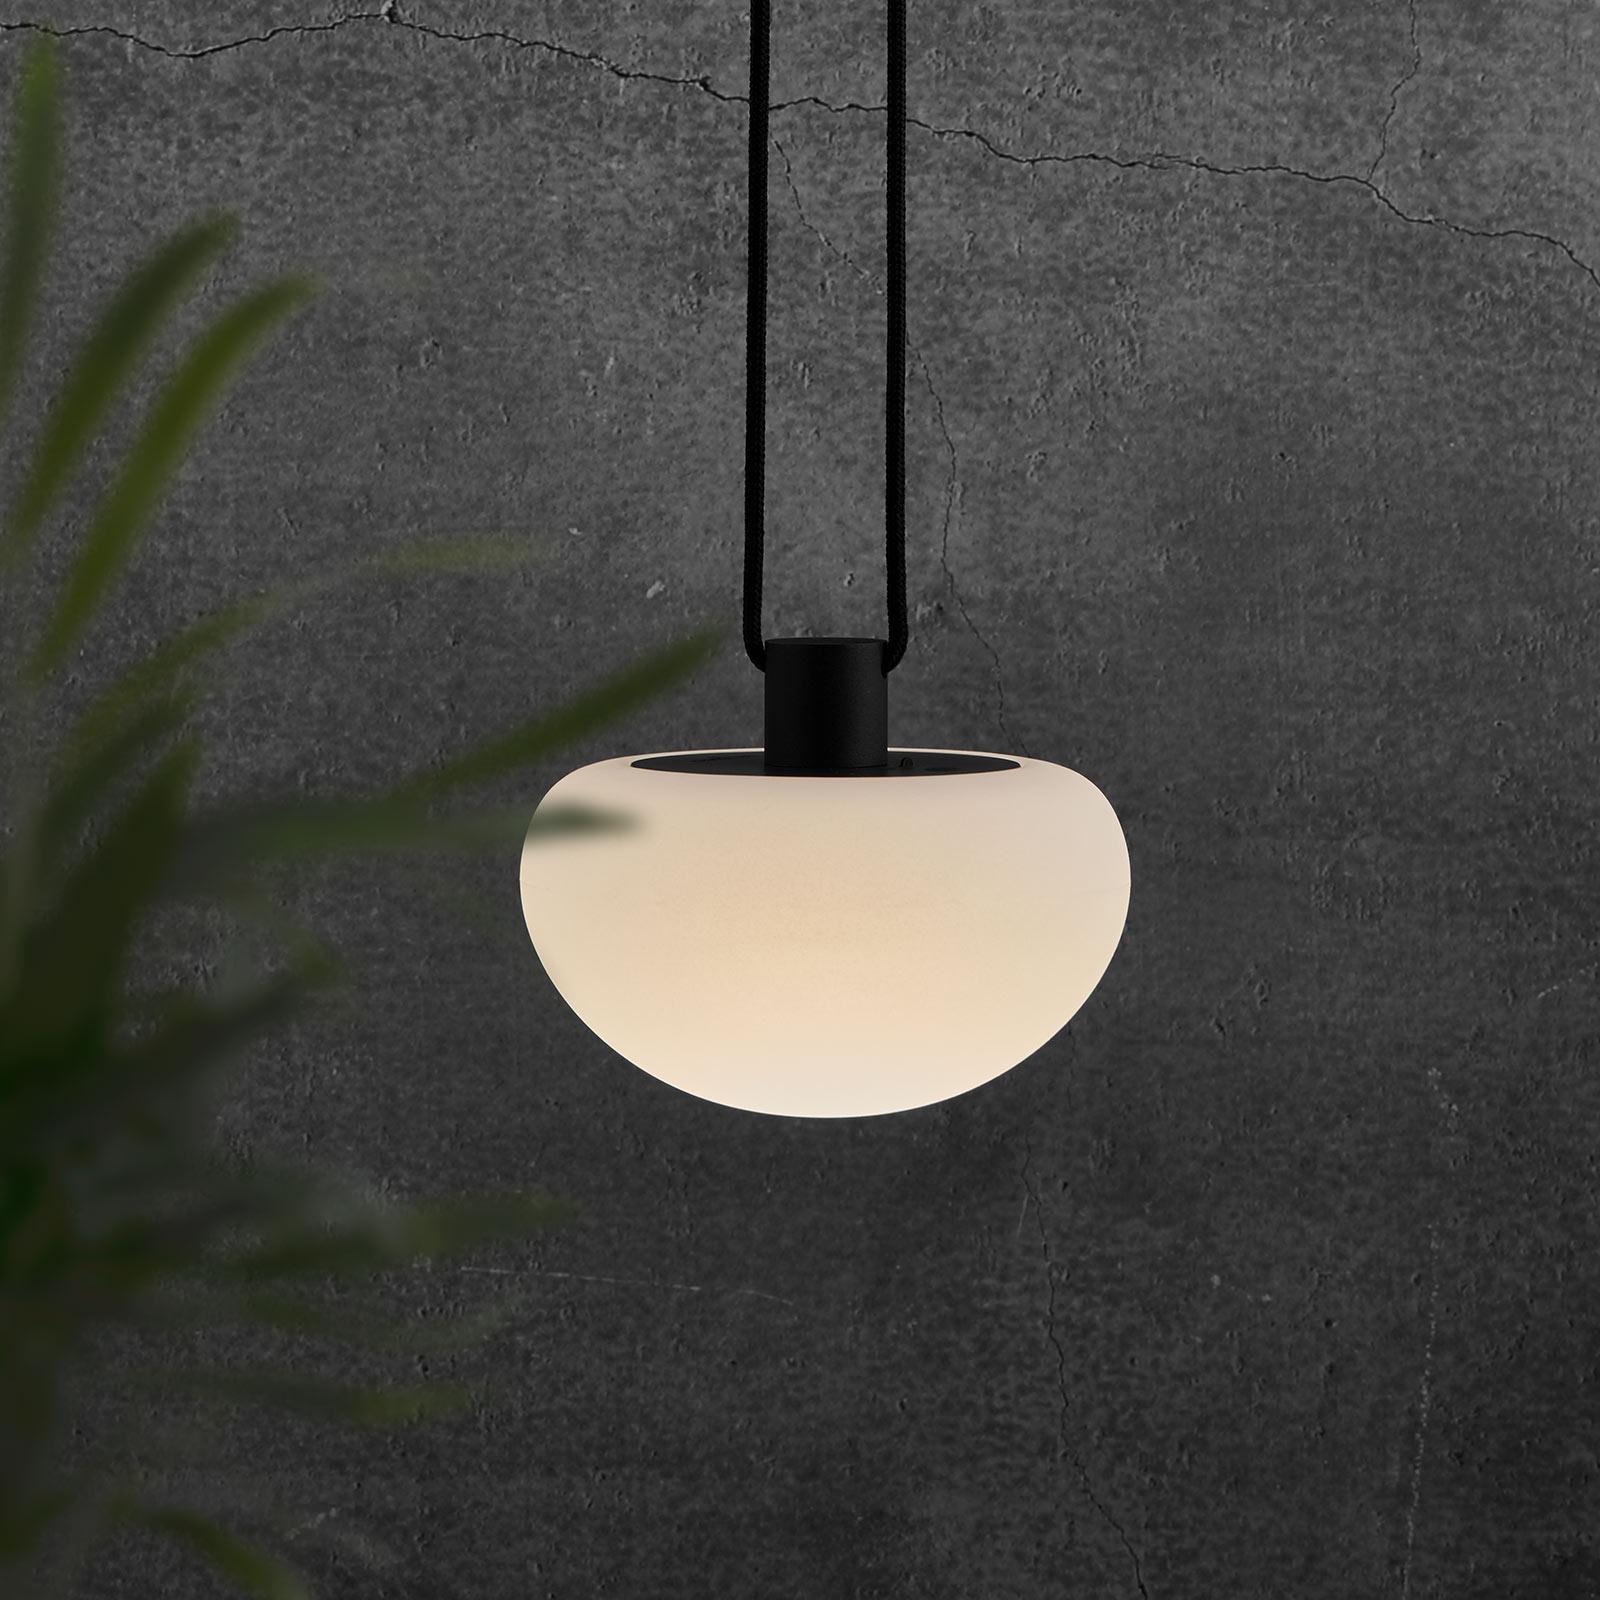 LED-koristevalaisin Sponge pendant, akku